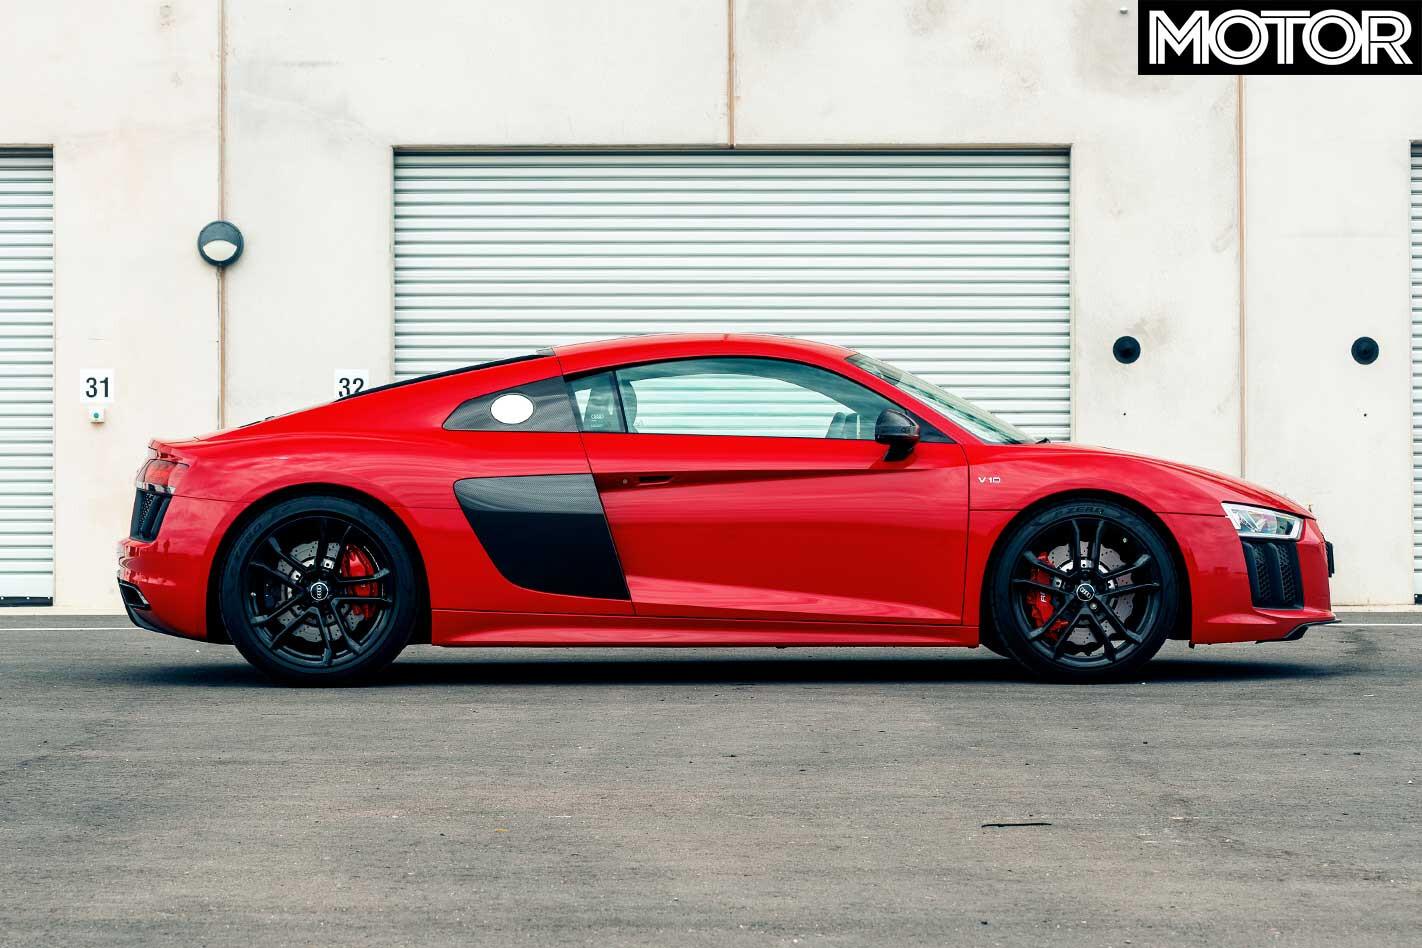 Audi R 8 RWS Side Profile Jpg